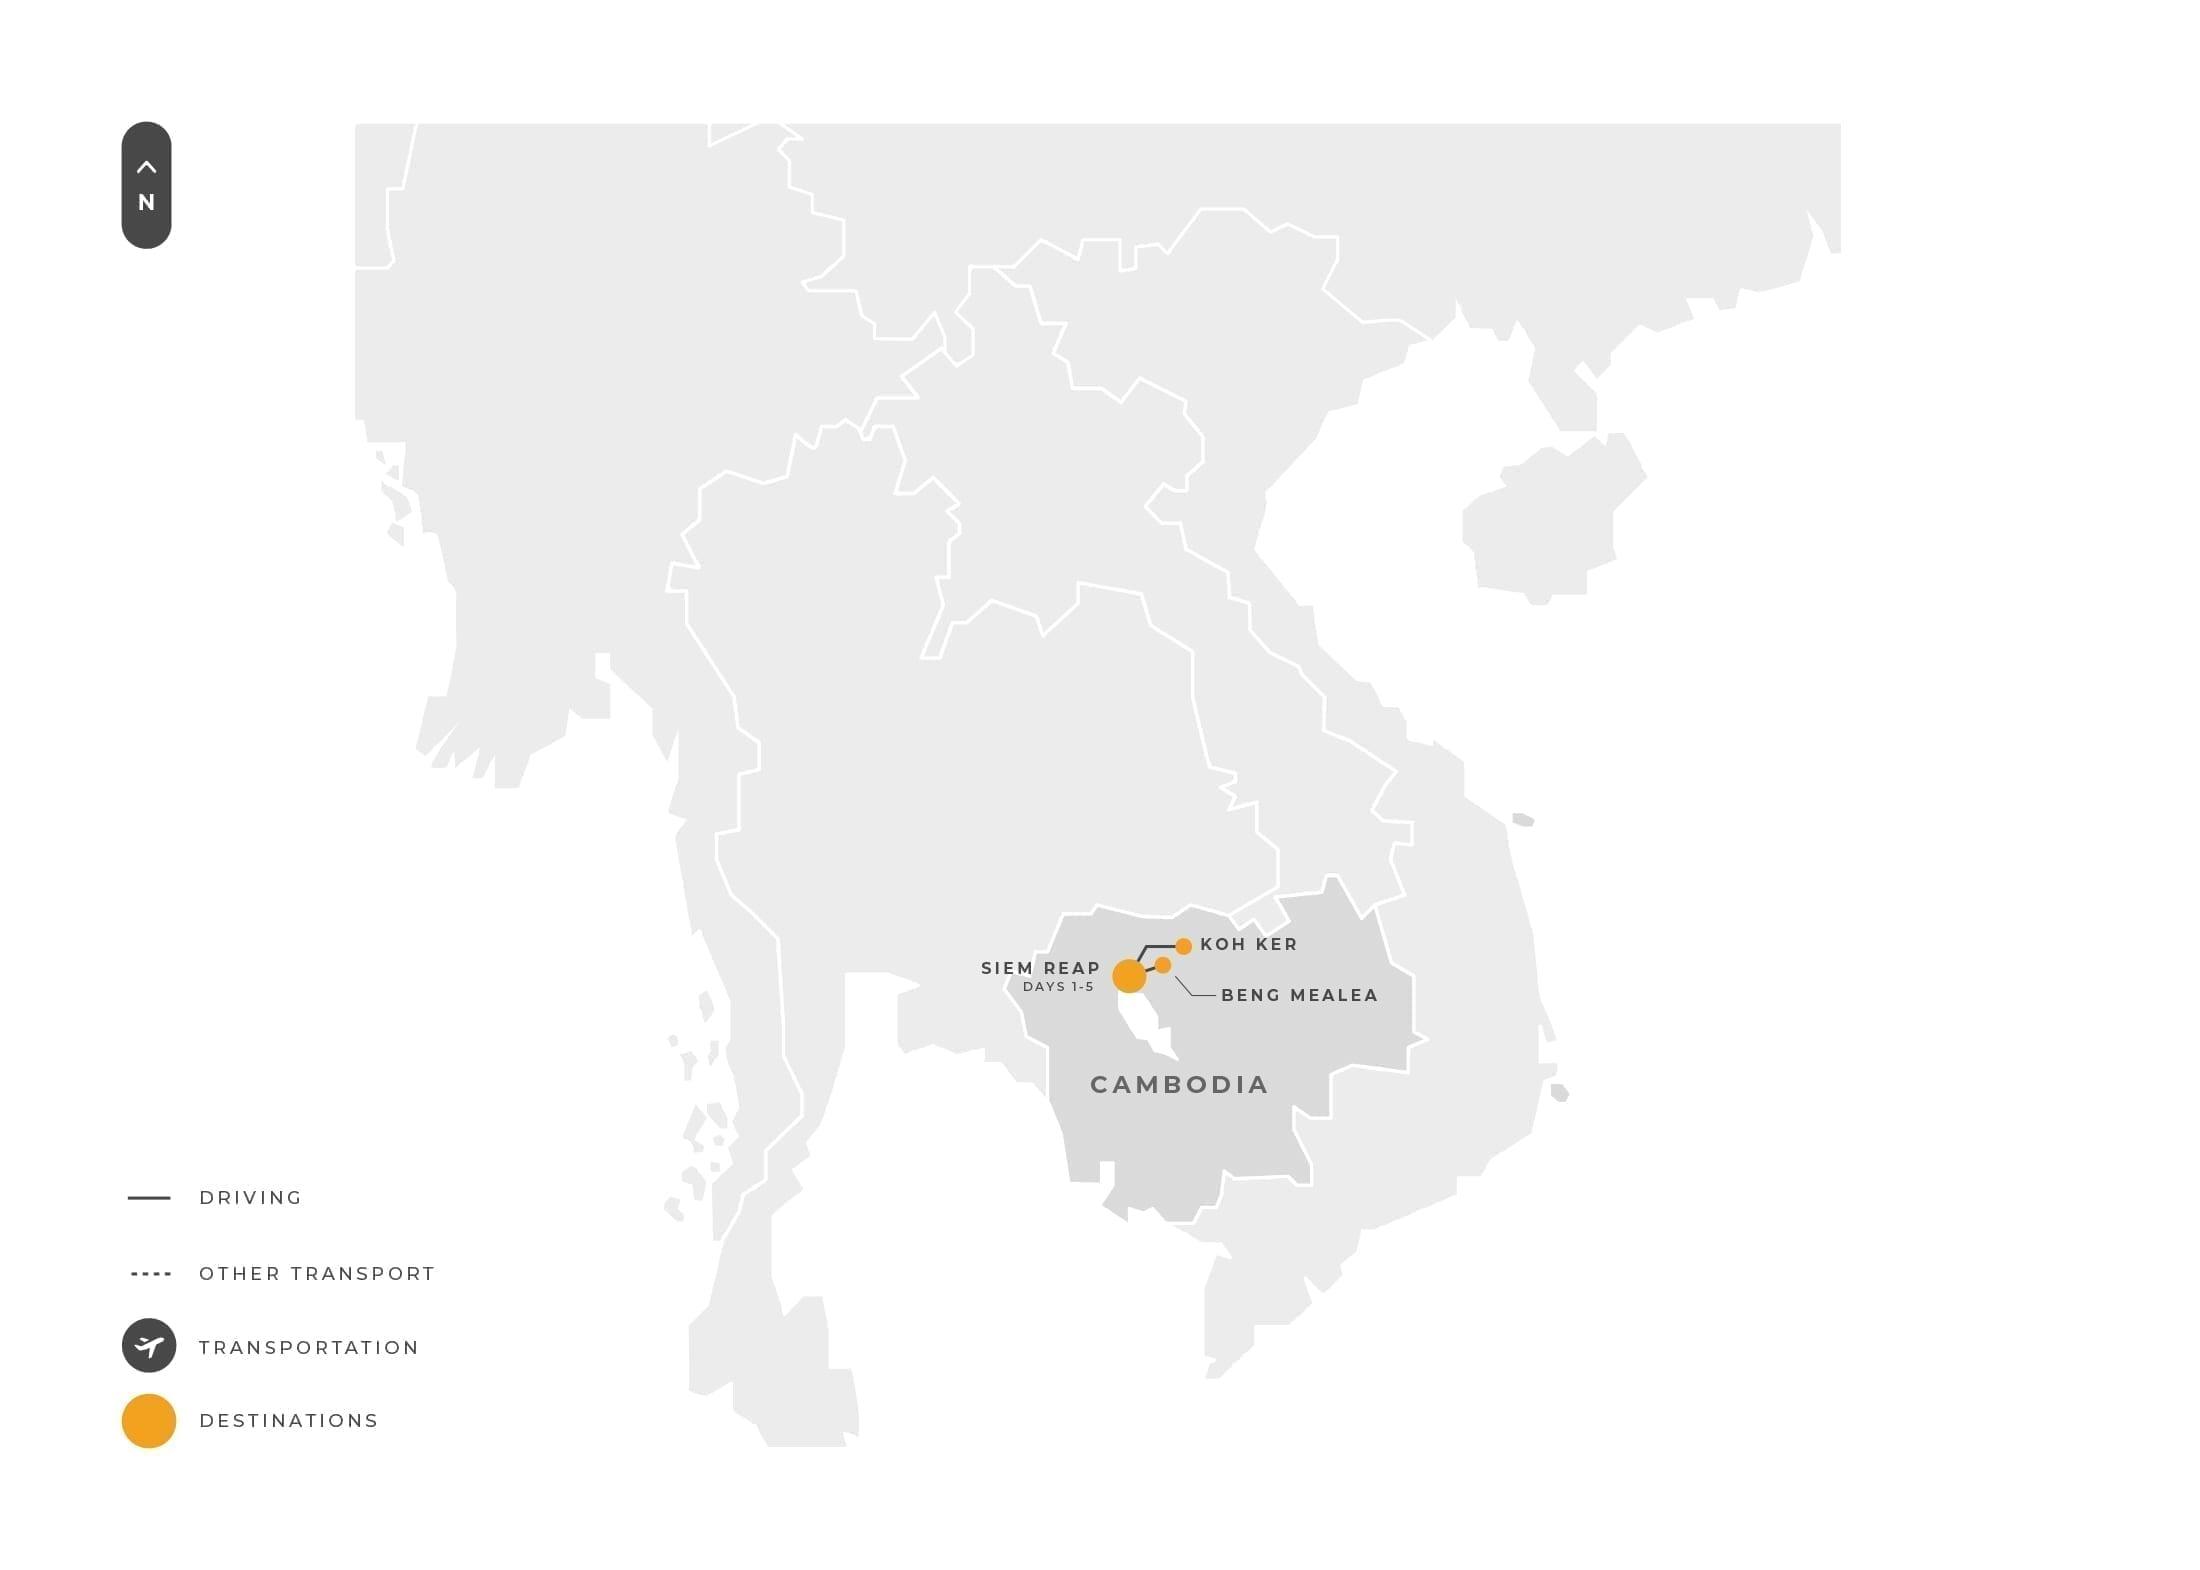 Cambodia 5 Days Siemreap Kohker Bengmealea Tour